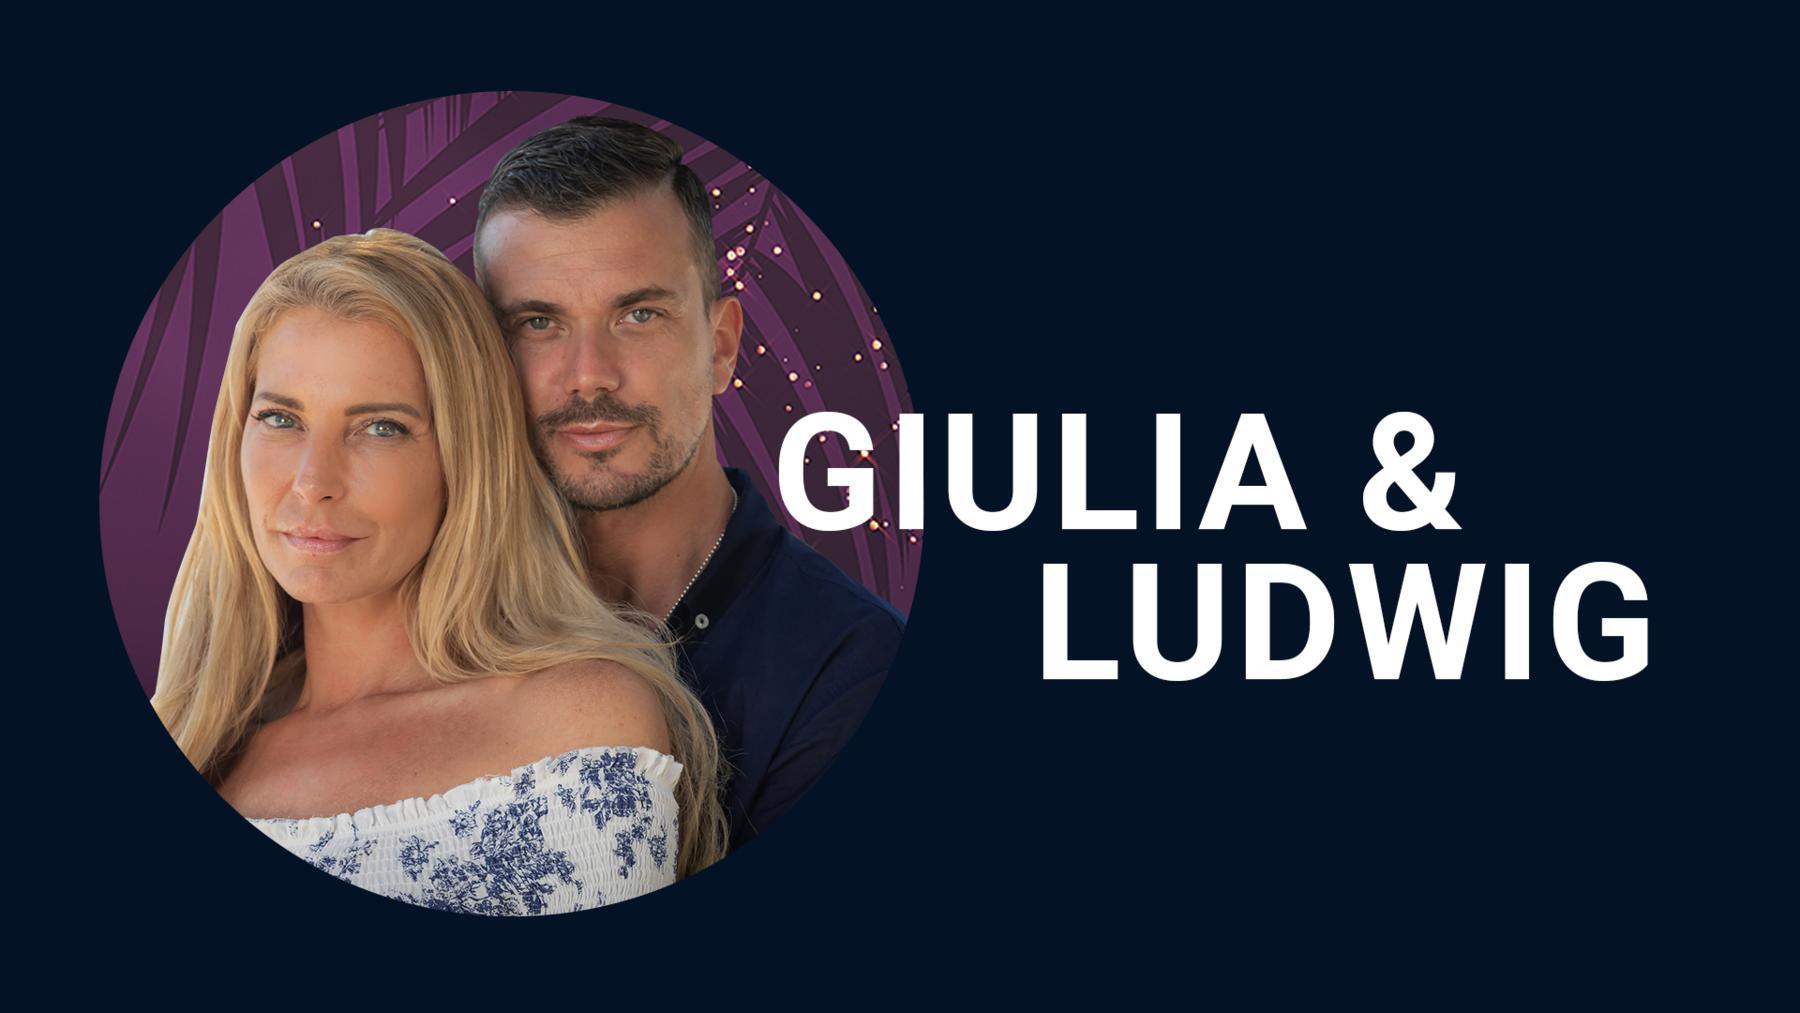 Giulia & Ludwig